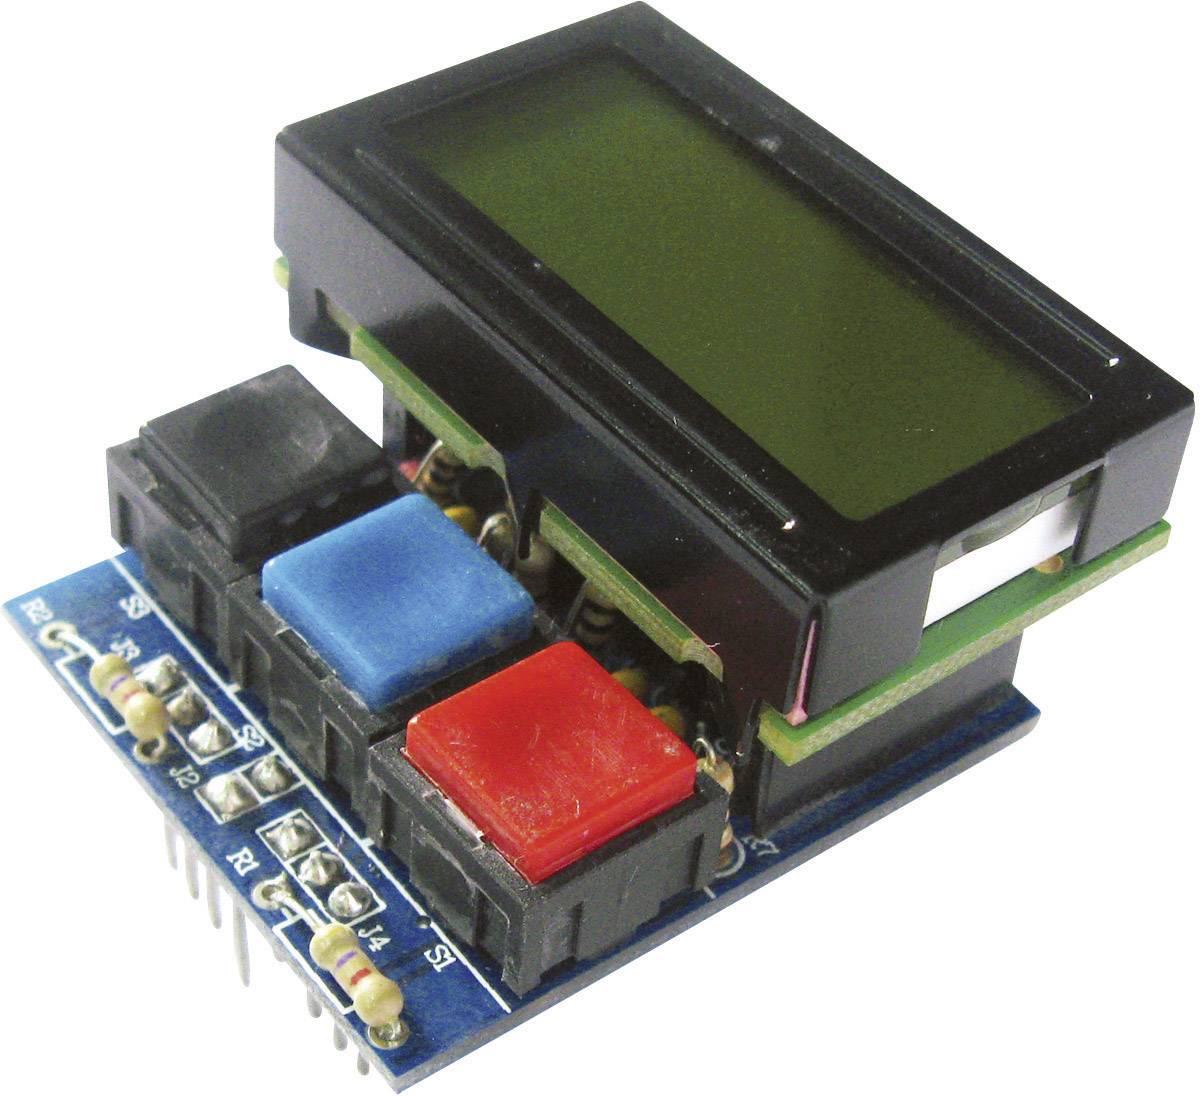 Displej ARX-DSP30 pro robota Arexx Asuro ARX-03